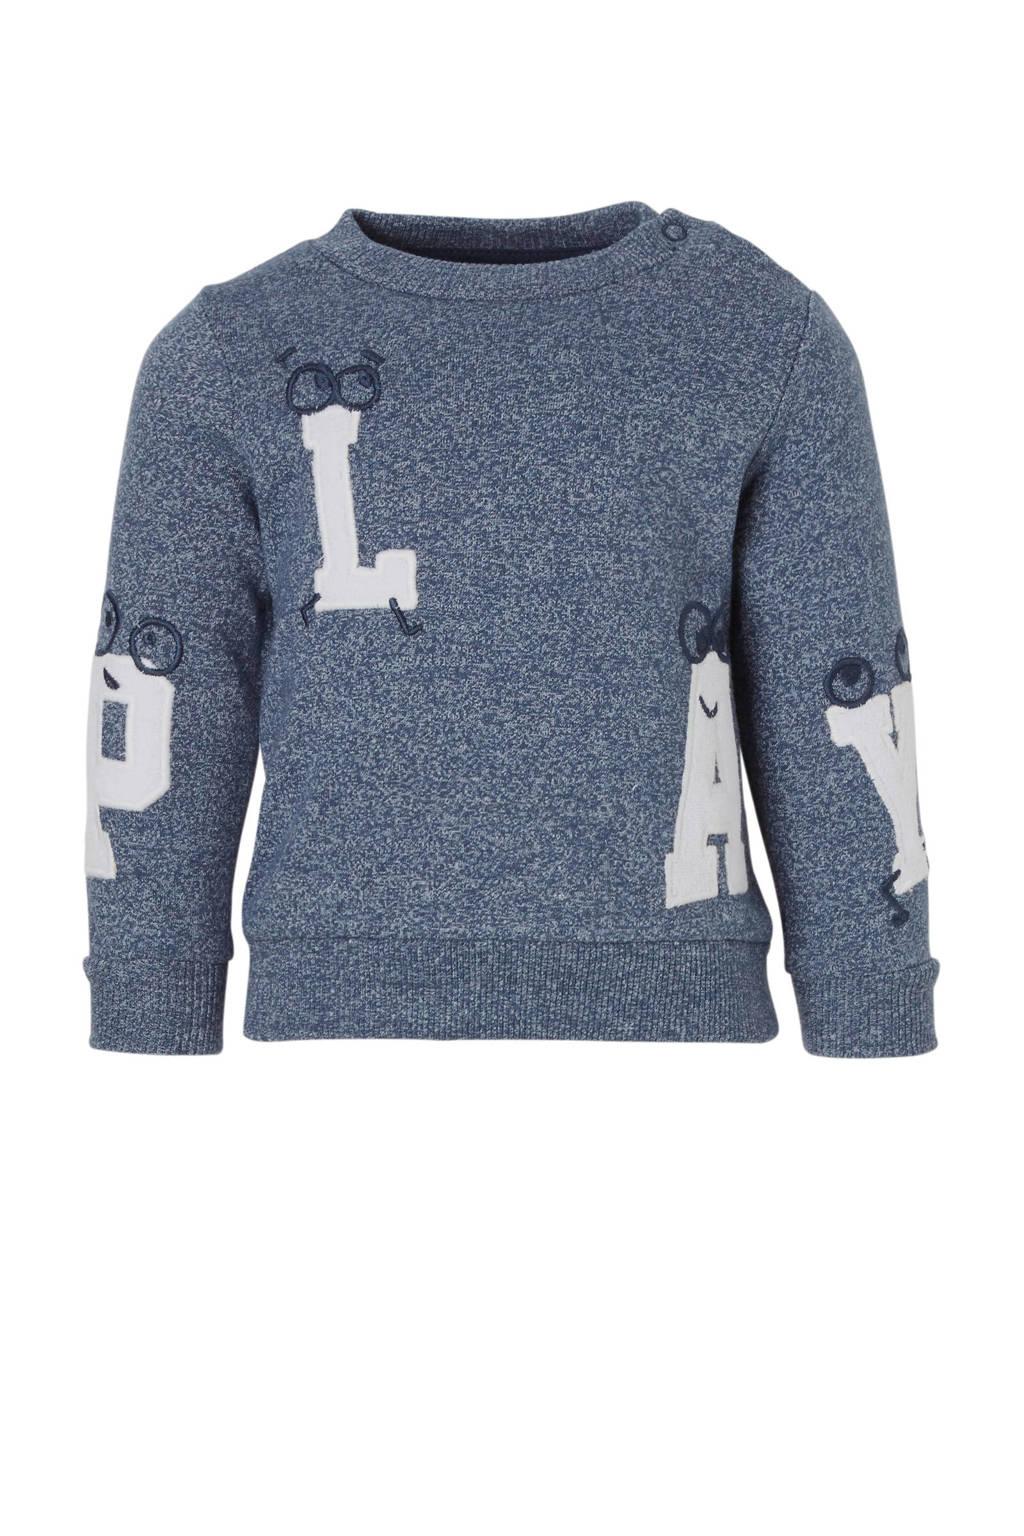 C&A Baby Club sweater met tekst blauw, blauw melange